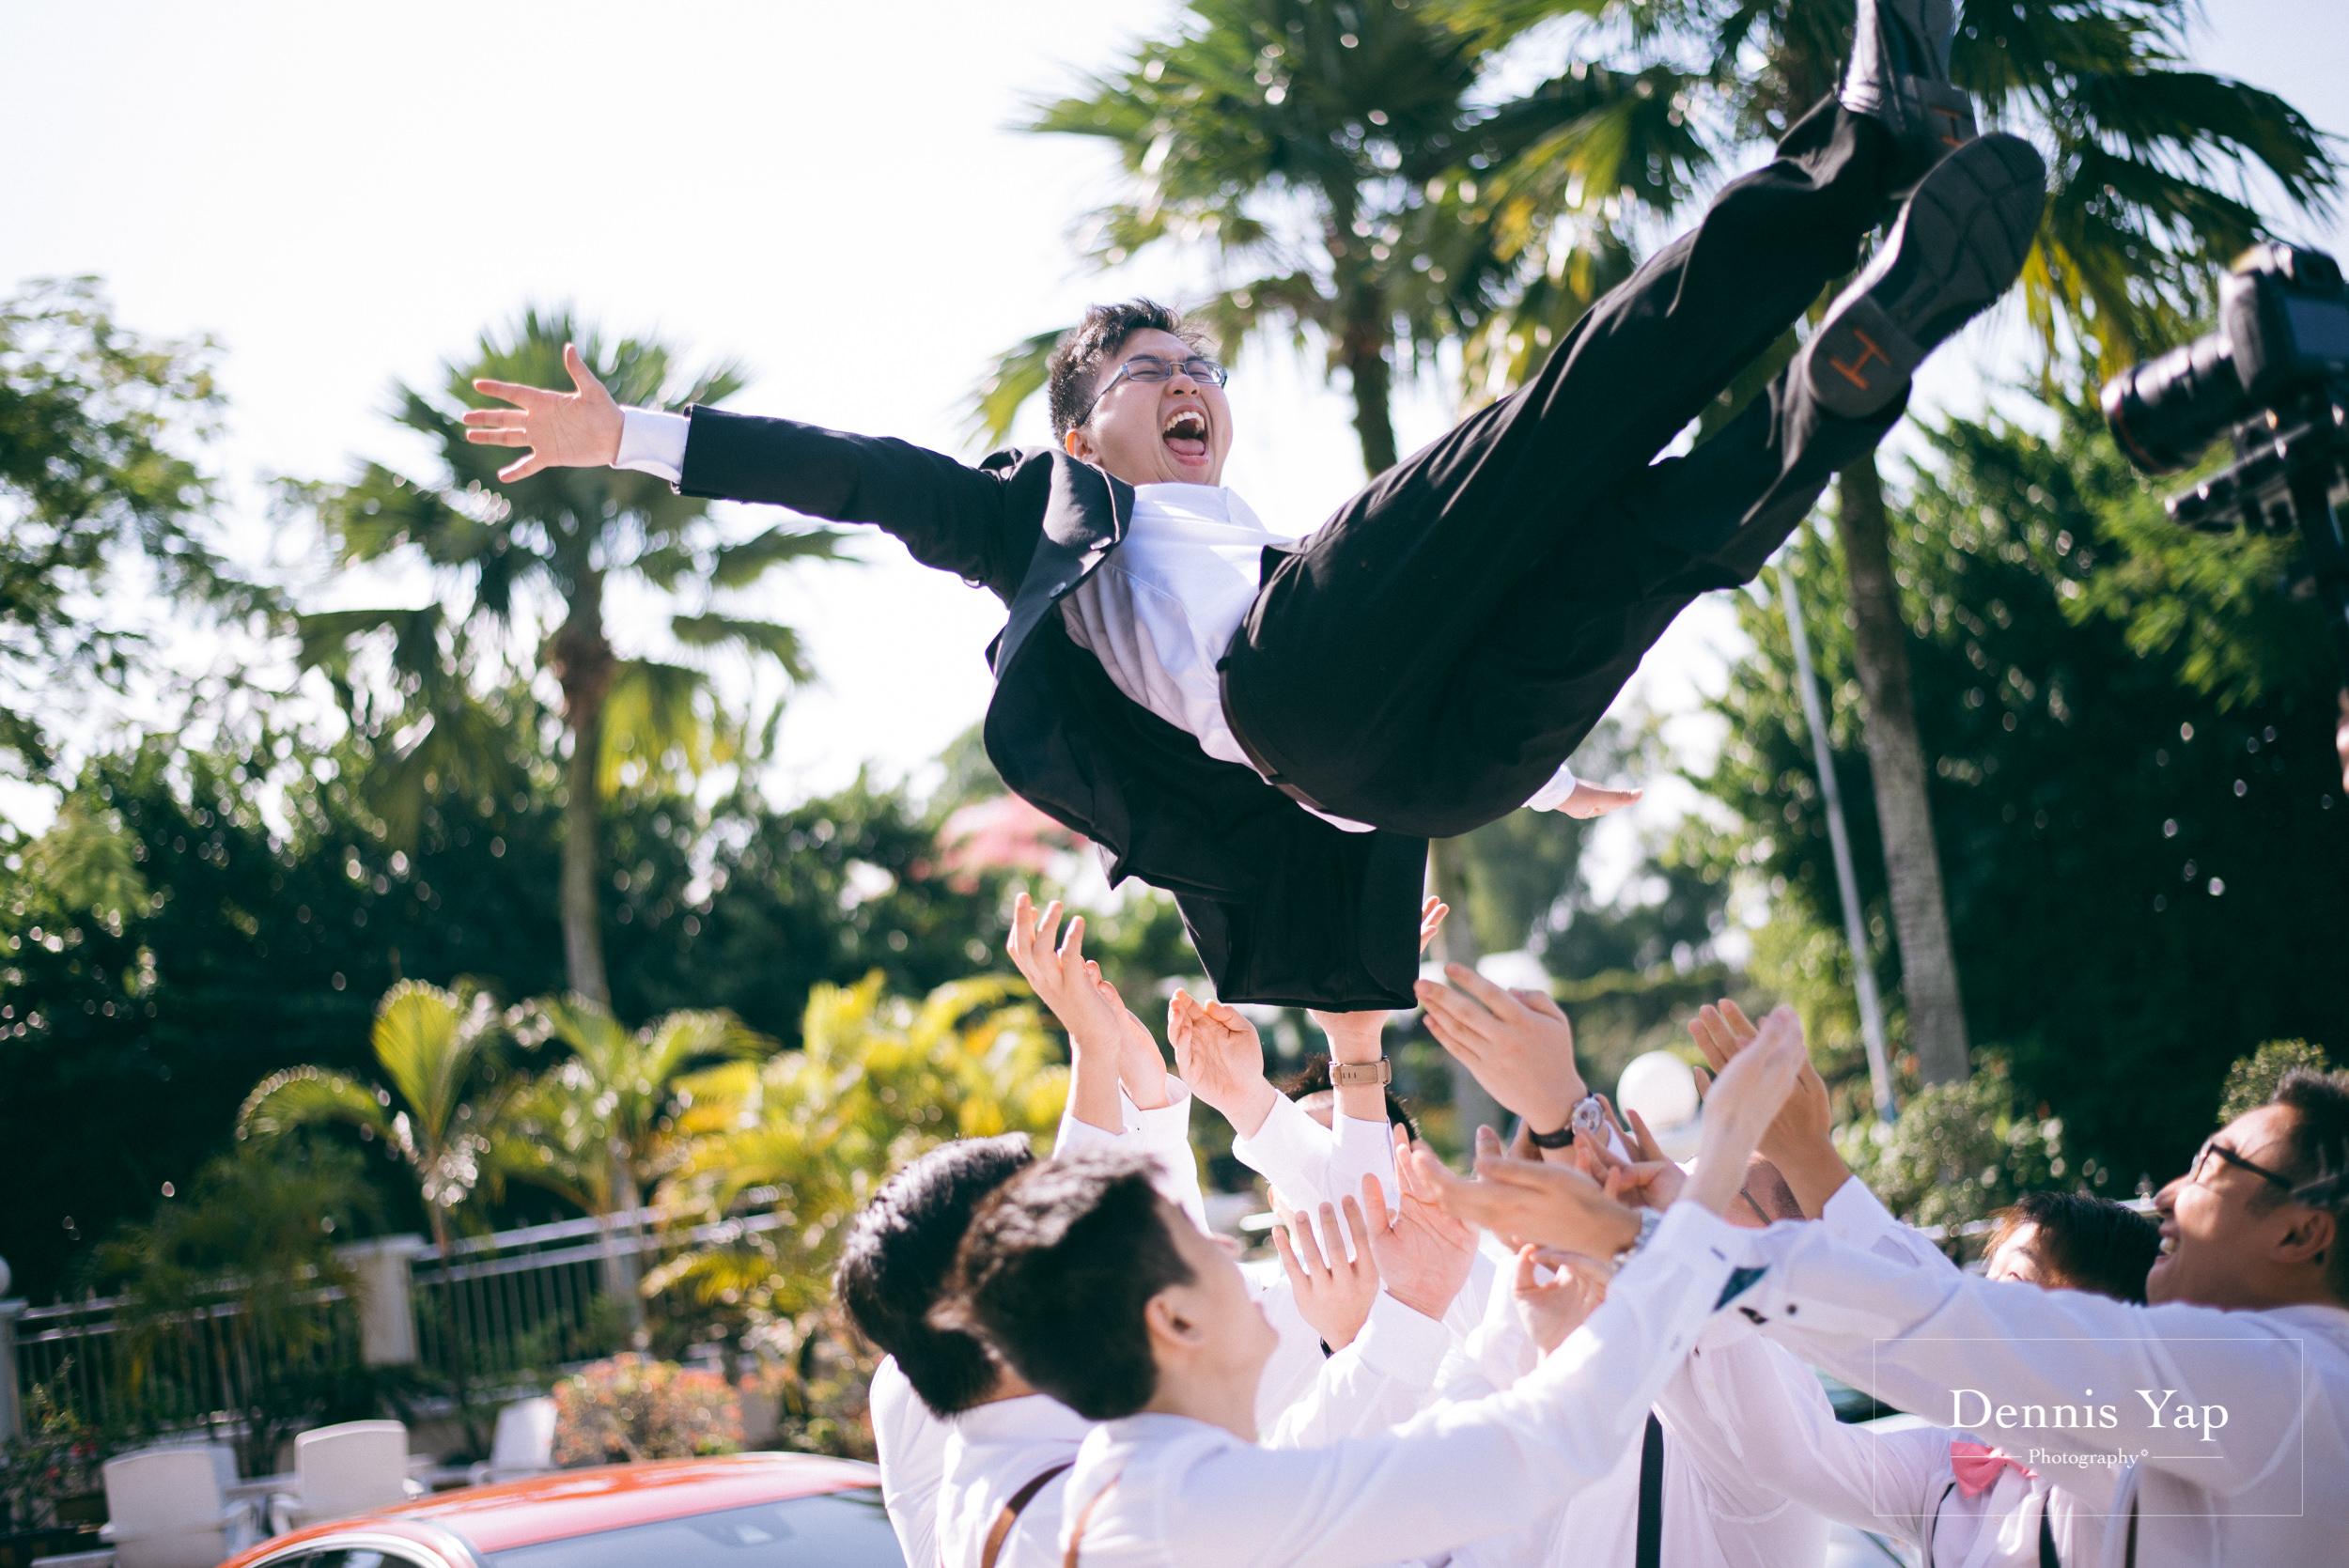 taylai cheng yee wedding day tropicana gold and country club damansara dennis yap photography-10.jpg